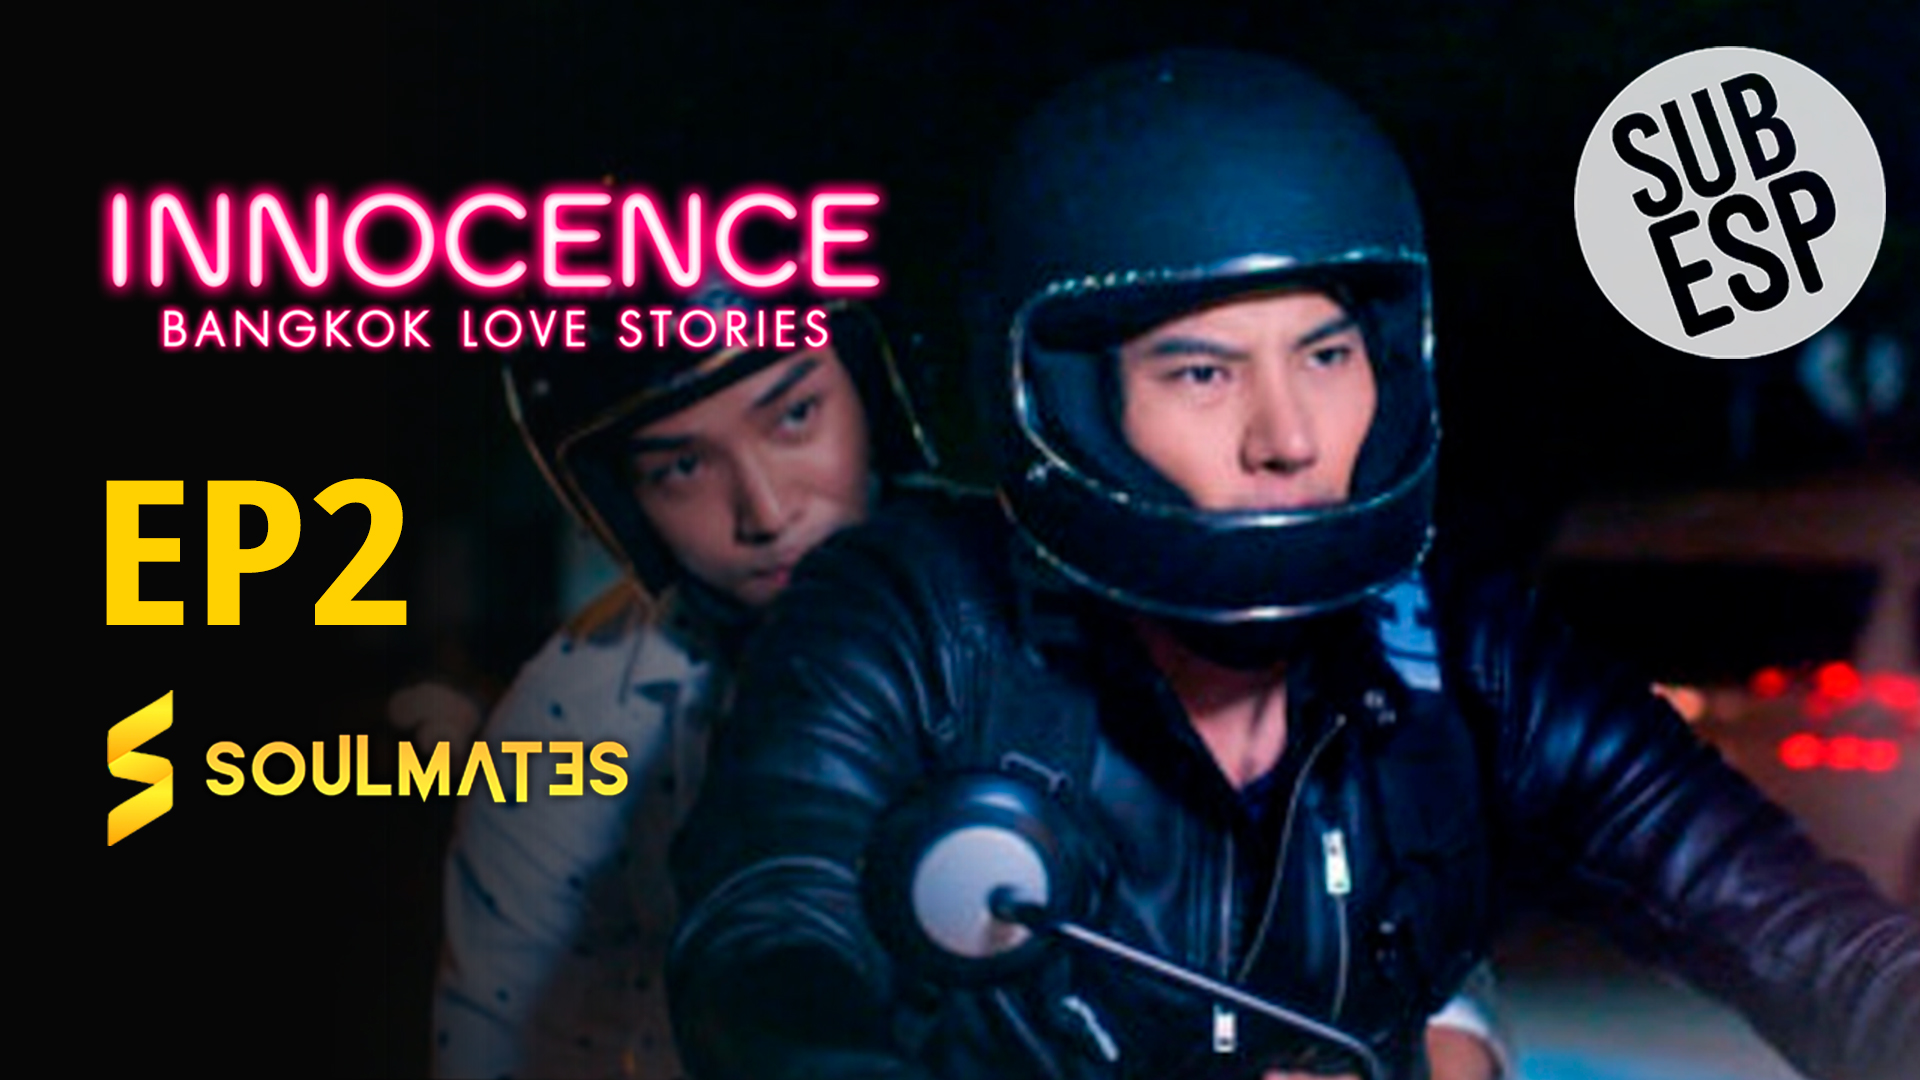 Bangkok Love Stories 2 Innocence : 1×2